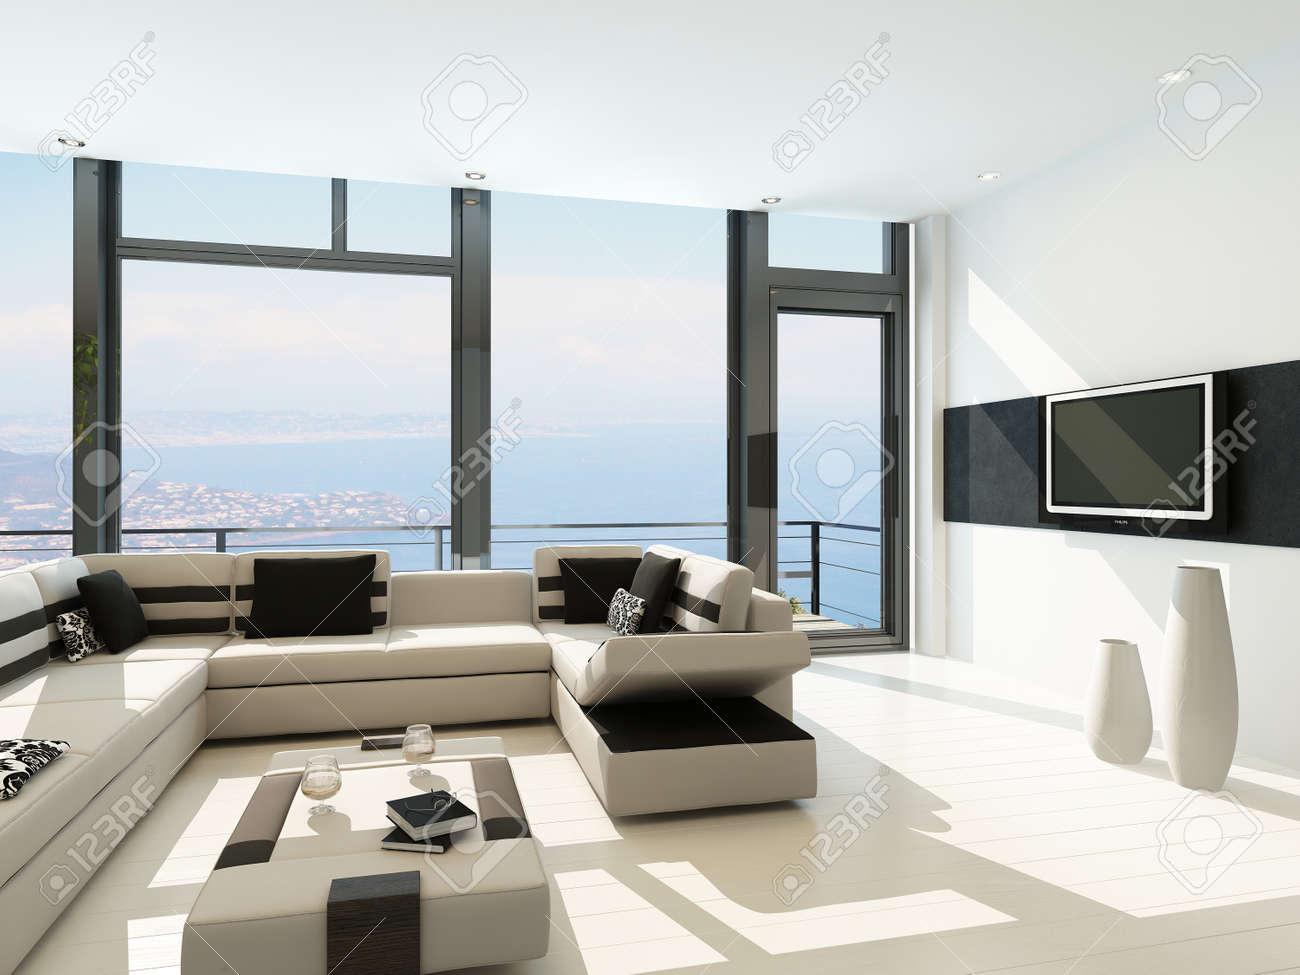 Moderne witte woonkamer interieur met prachtig zeegezicht weergave ...